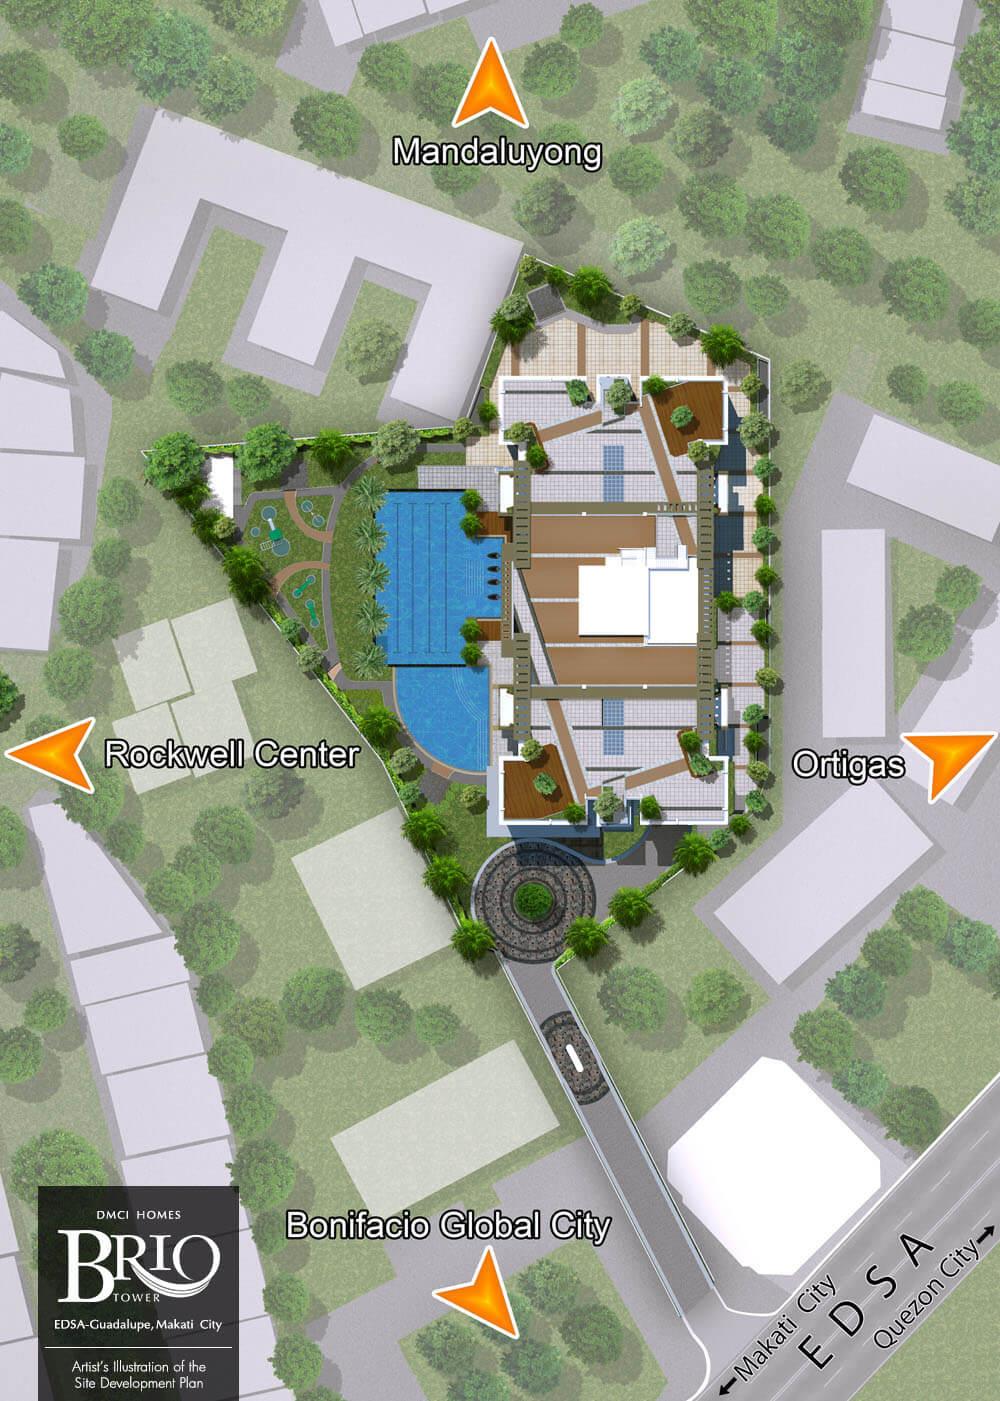 Brio Tower Site Dev't Plan DMCI